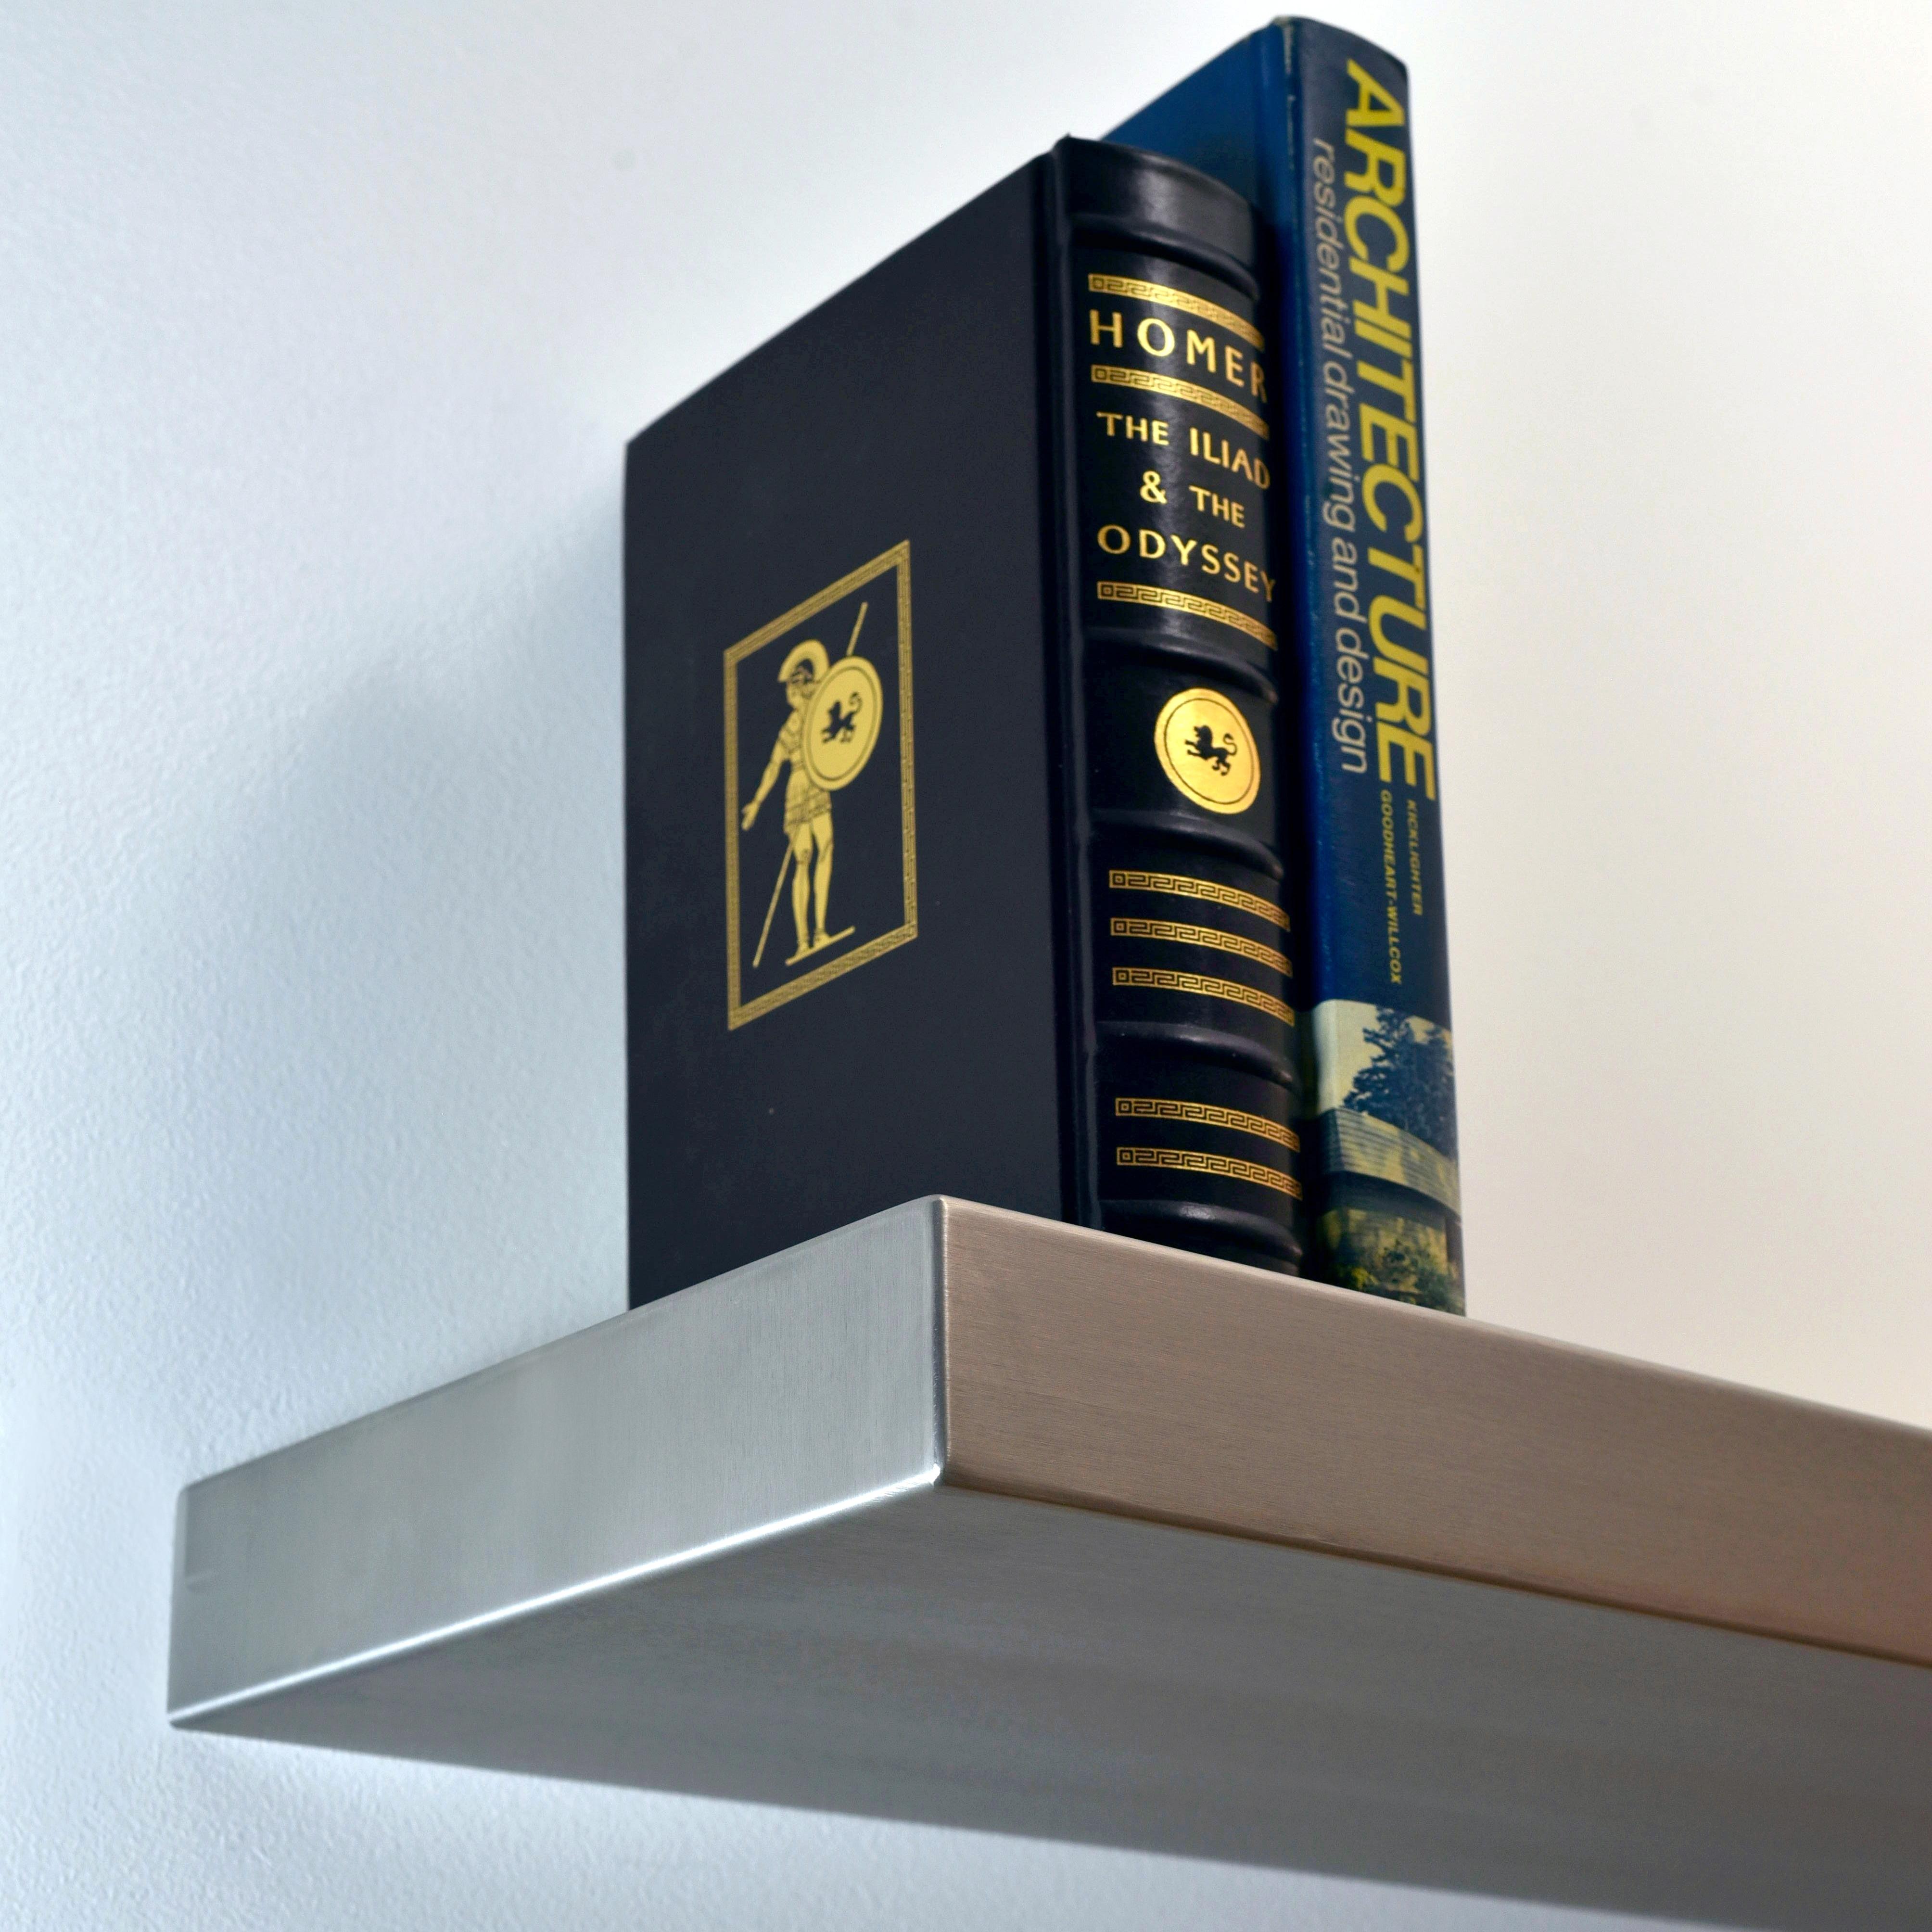 Floating Shelves Seamless Custom Metal Home : Floating shelf seamless from custommetalhome.com size 500 x 500 jpeg 31kB